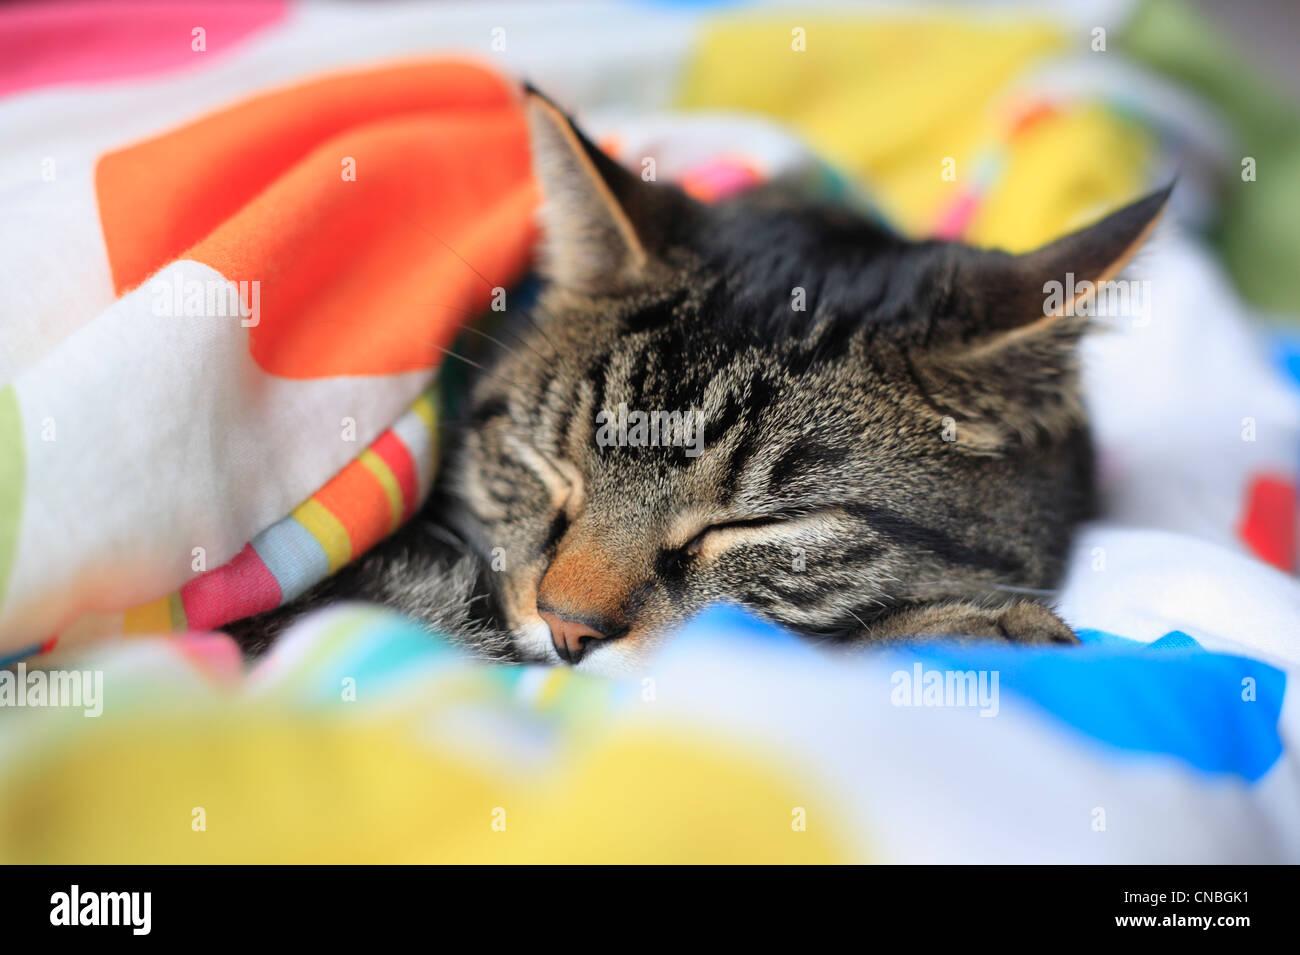 Male tabby cat asleep under a child's duvet. - Stock Image